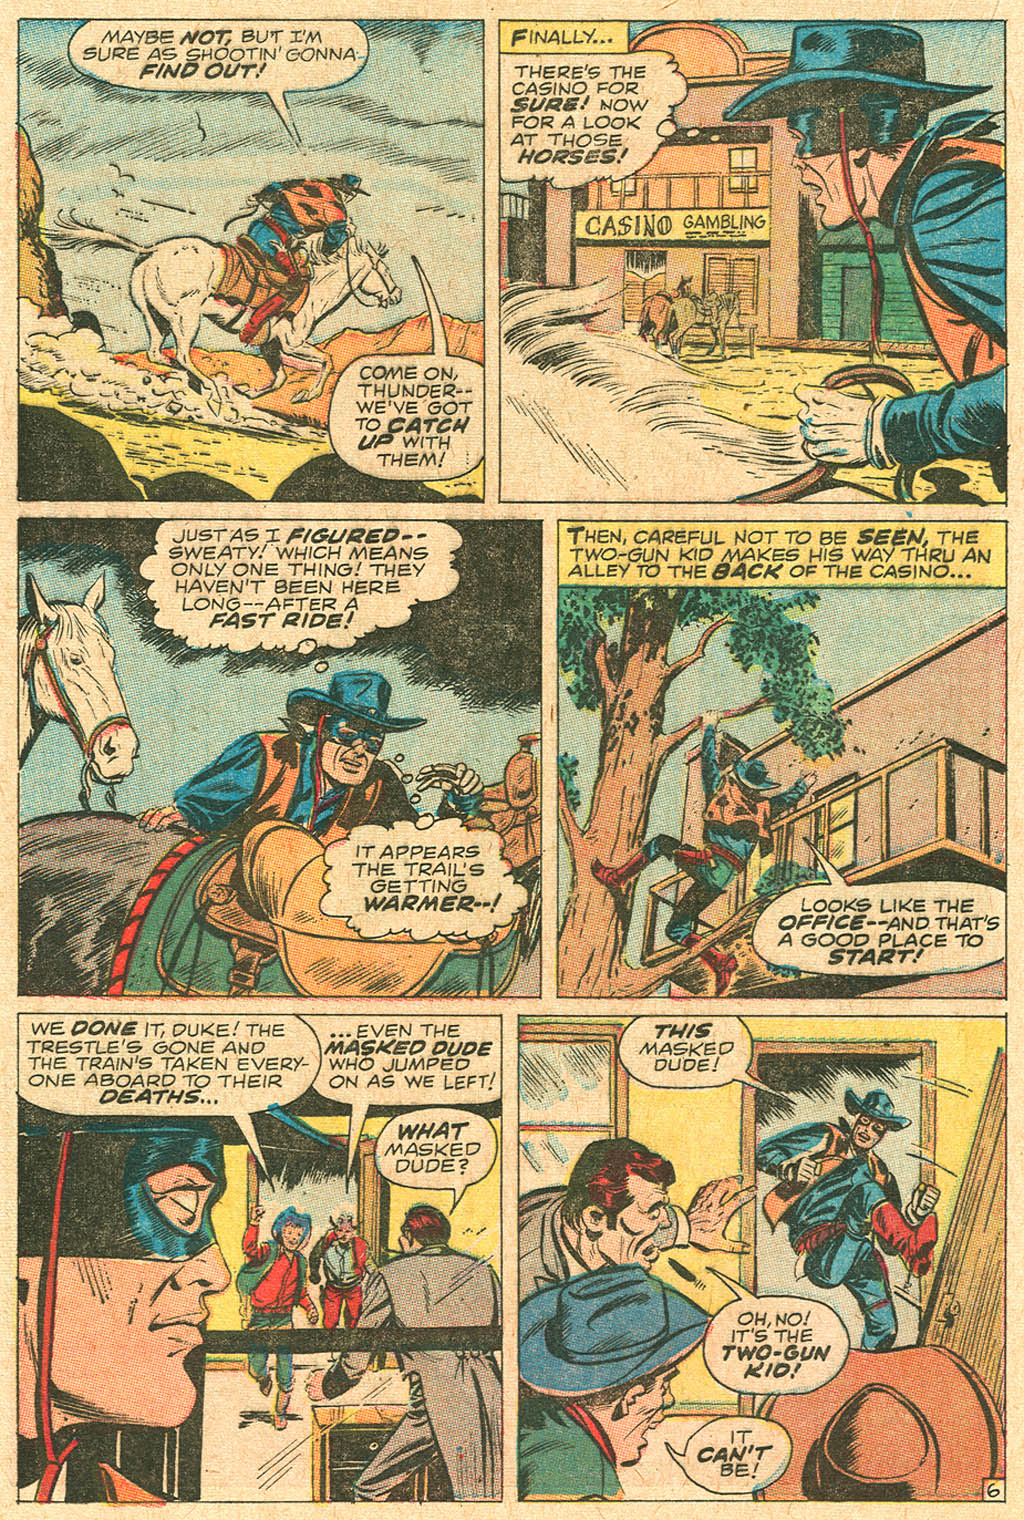 Read online Two-Gun Kid comic -  Issue #92 - 20